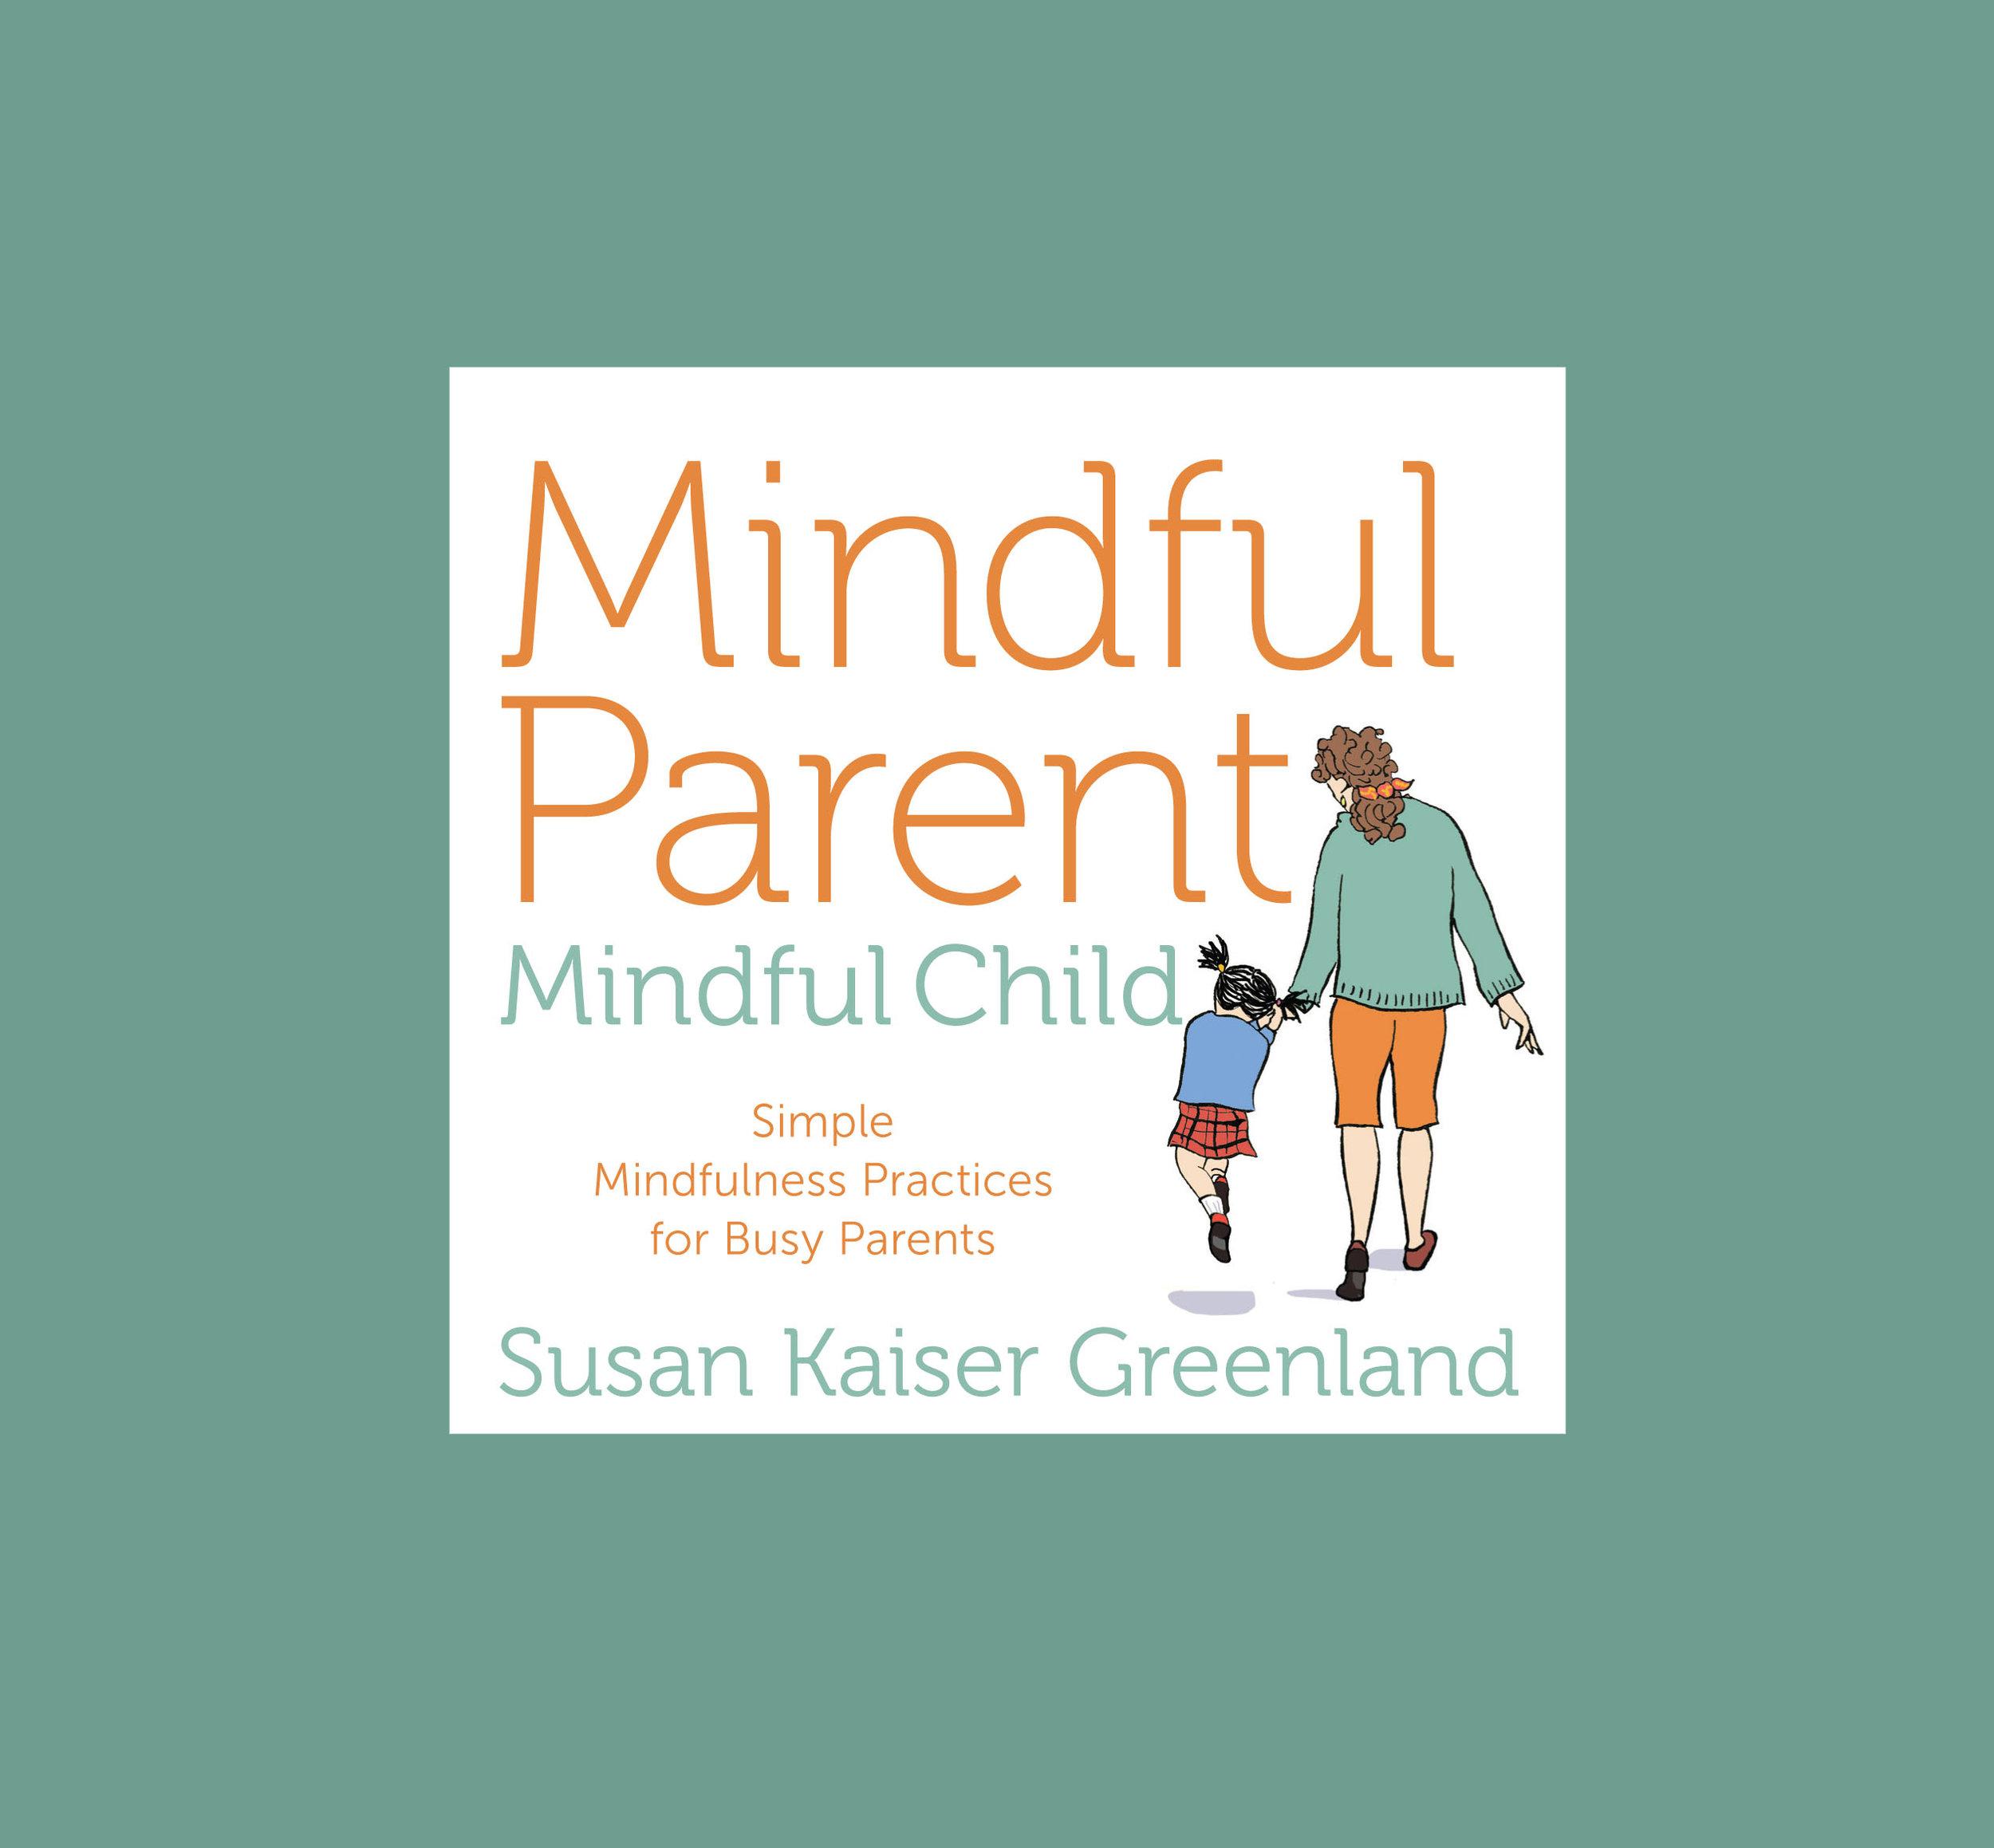 skg mindful parent mat B.jpg